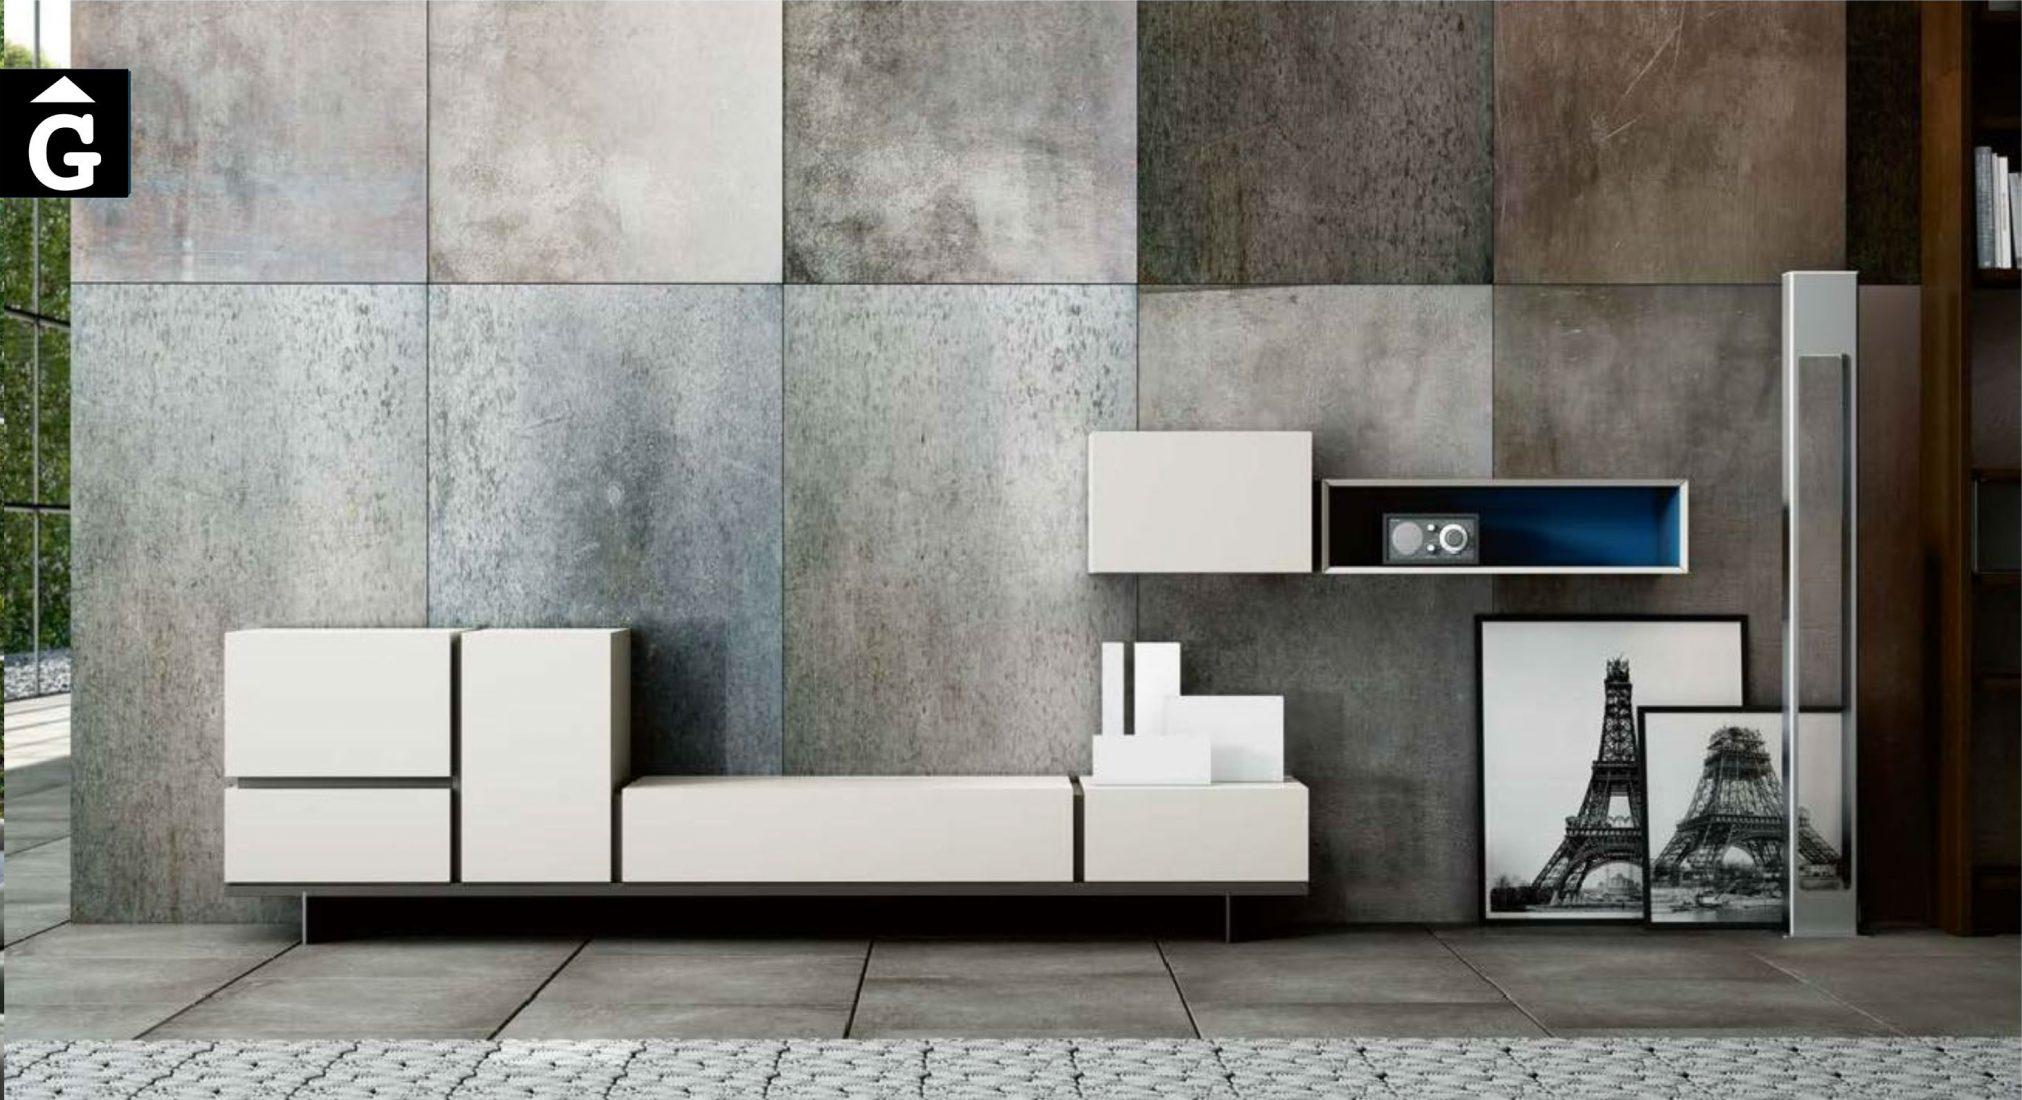 MOBLE-28-CONNECTOR-EMEDE-mobles-by-Mobles-GIFREU-Girona-ESPAI-EMEDE-Epacio-emede-Muebles-MD-moble-menjador-Sala-estar-habitatge-qualitat-laca-xapa-natural